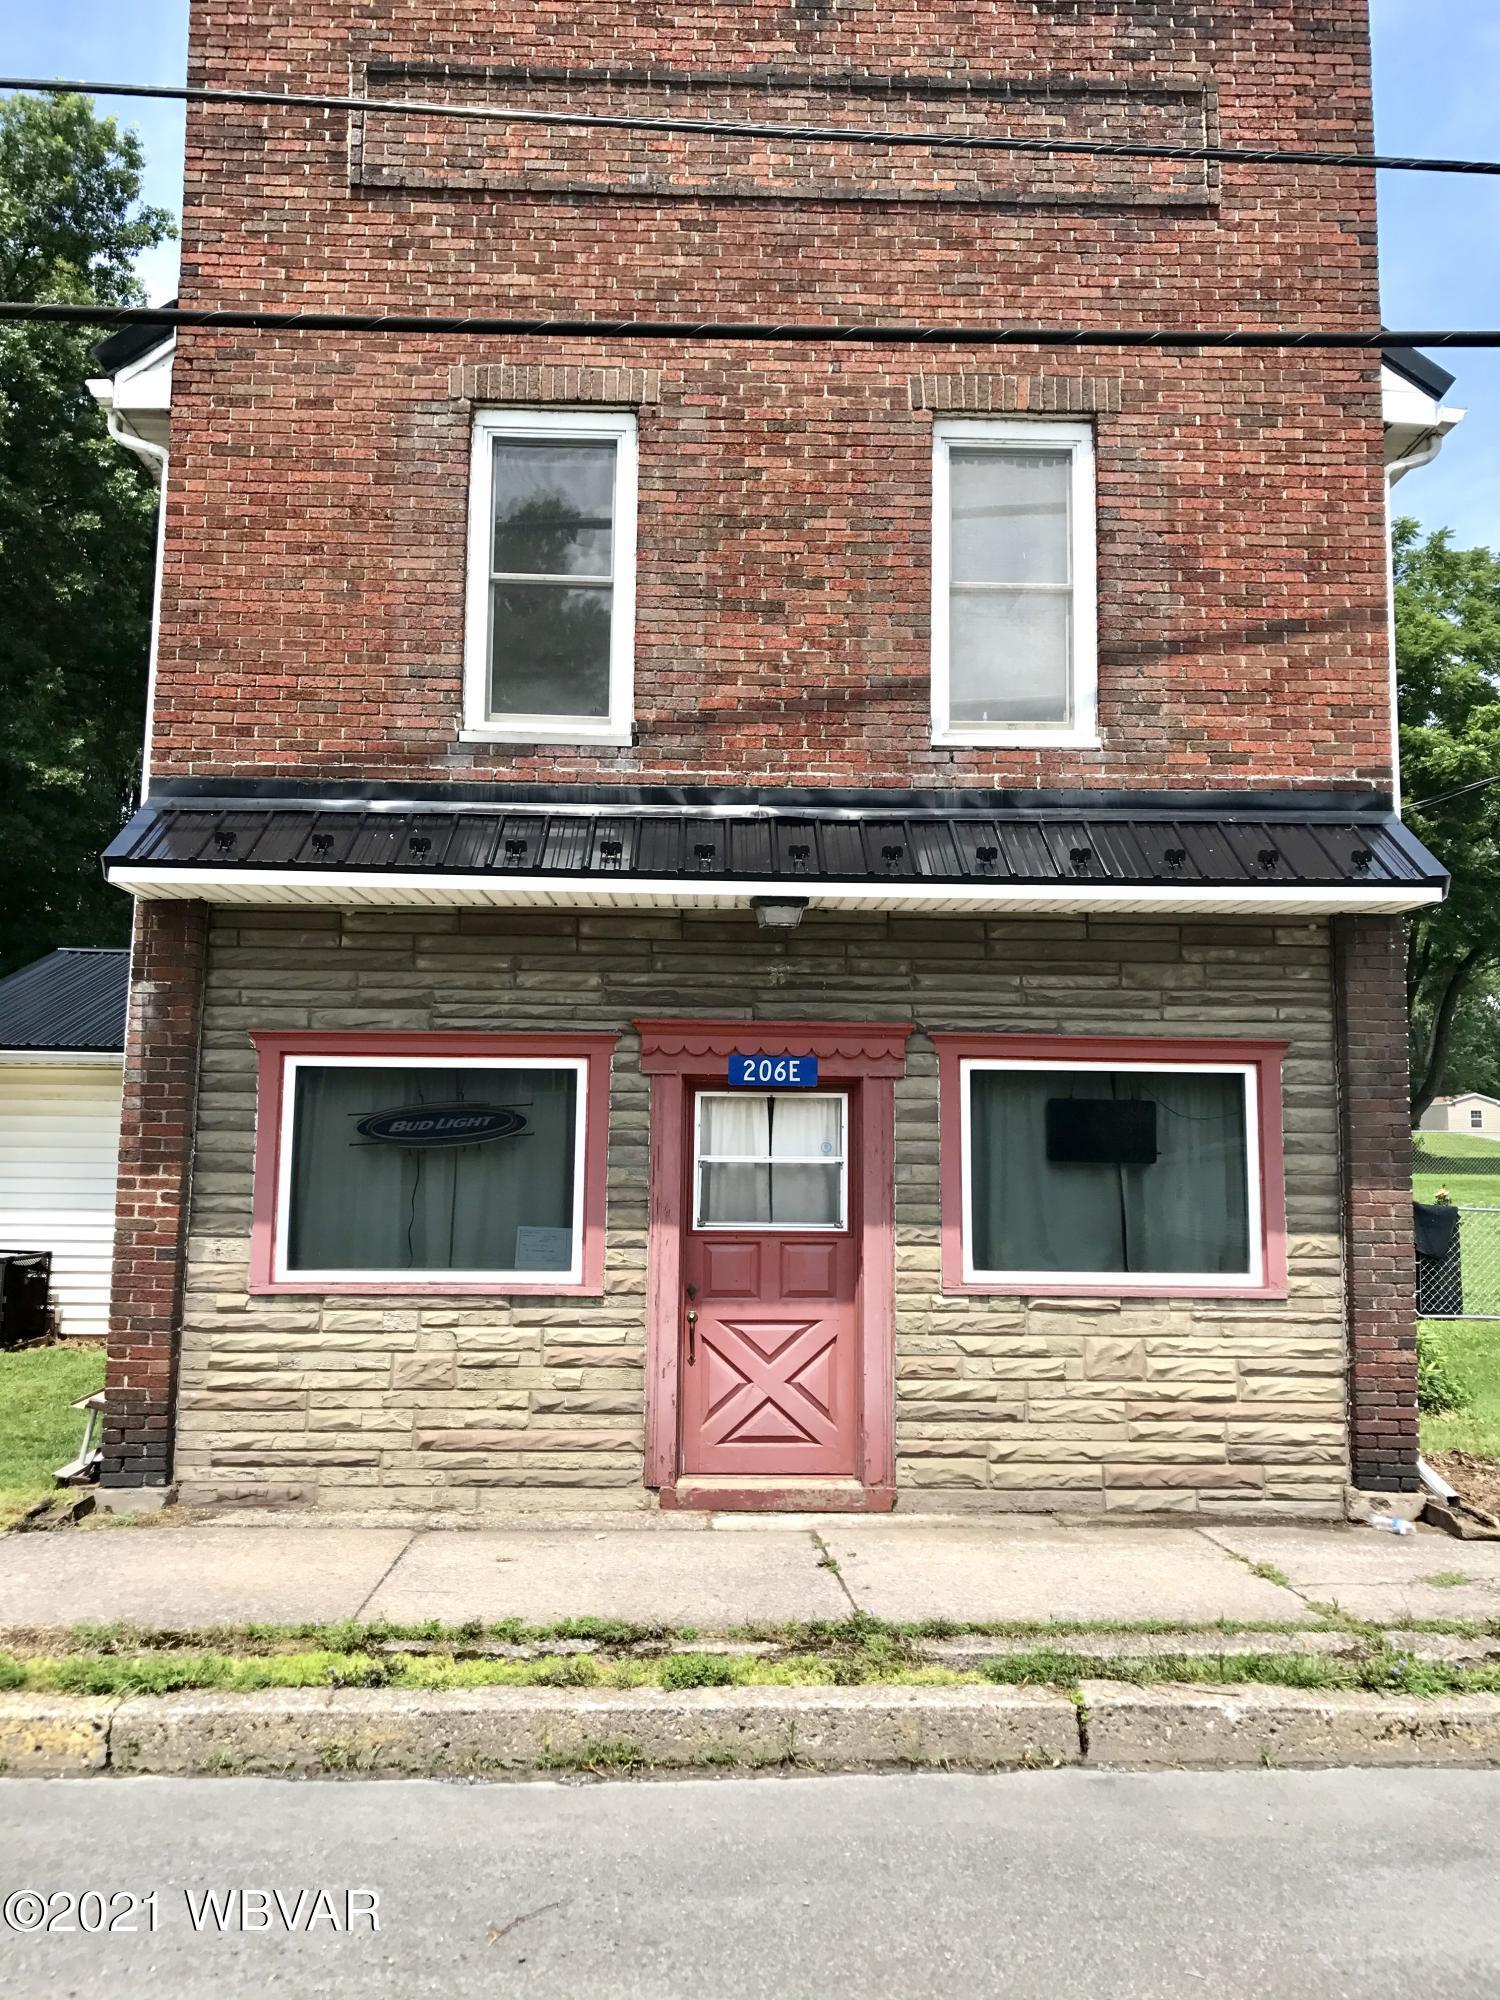 000 CENTRAL AVENUE, Avis, PA 17721, ,3 BathroomsBathrooms,Commercial sales,For sale,CENTRAL,WB-91954